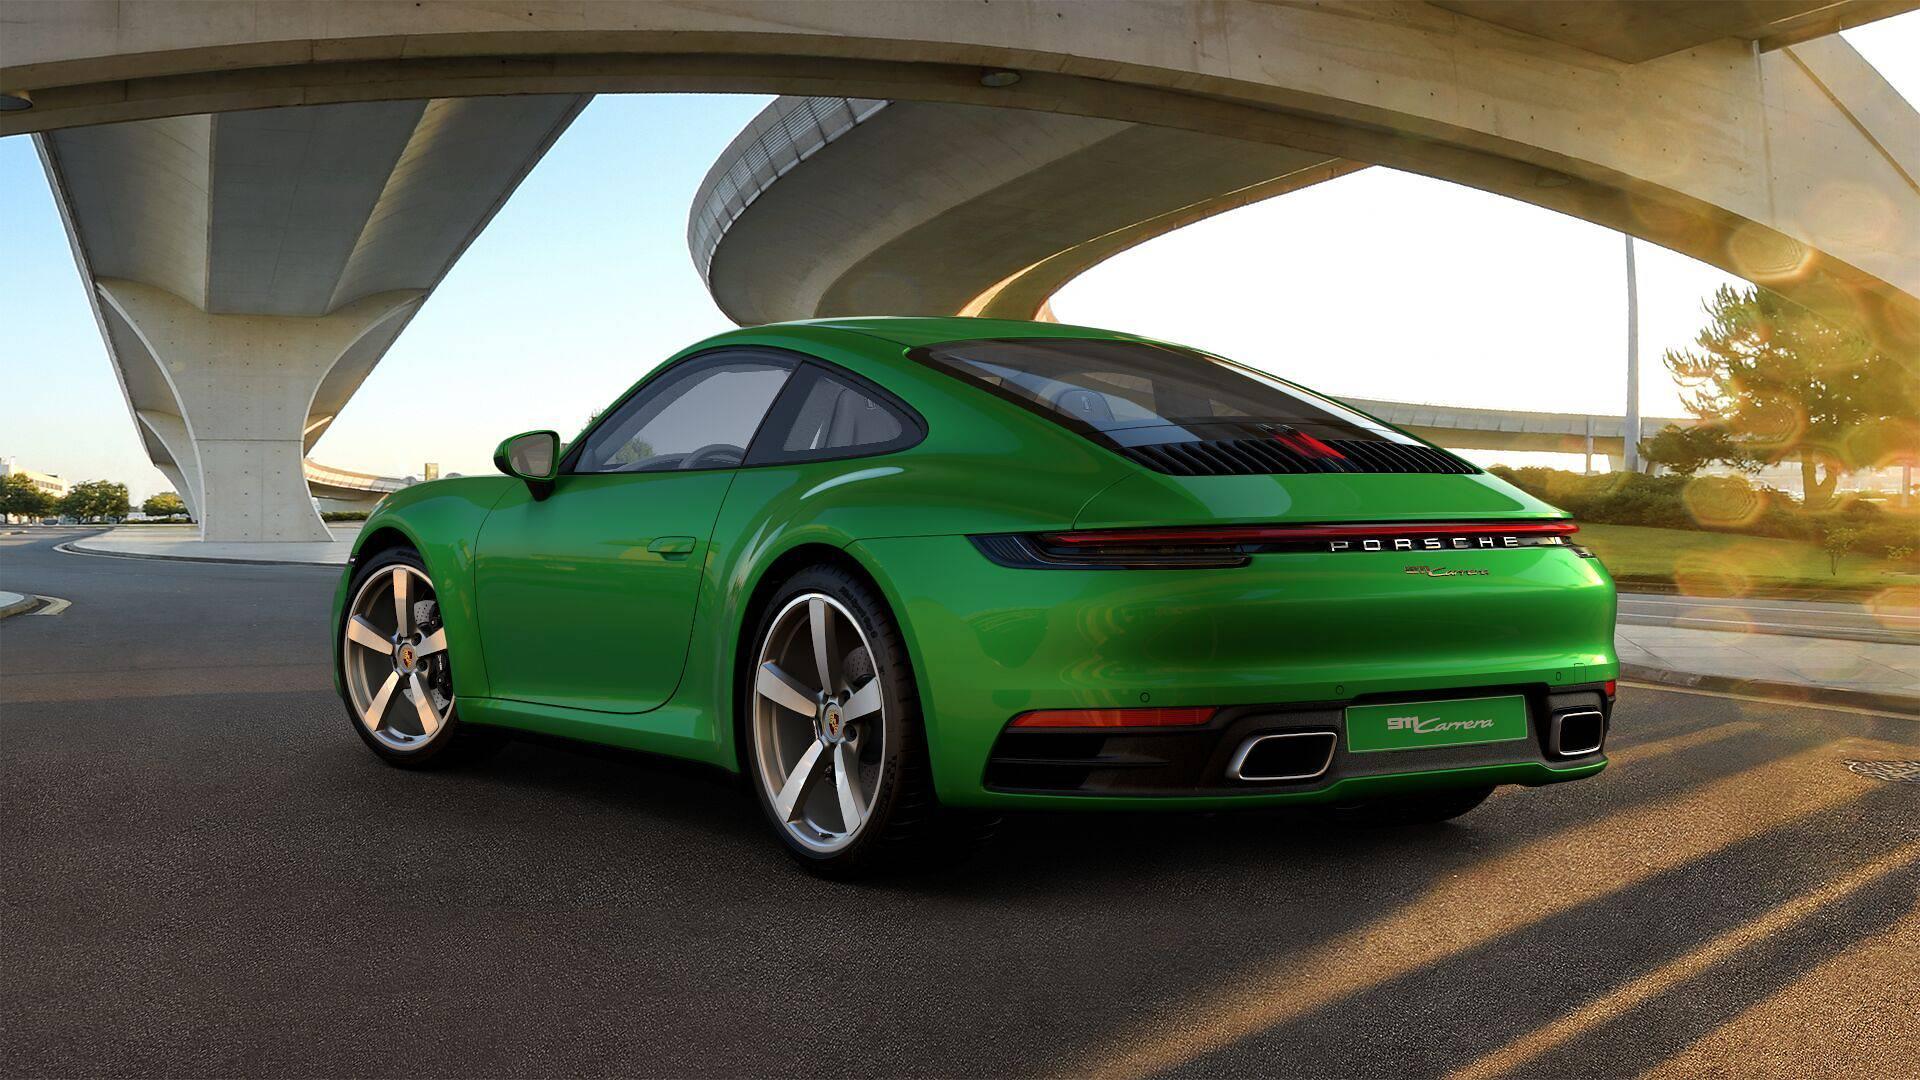 Supersprint sportsudstødning til Porsche 911 992 Carrera